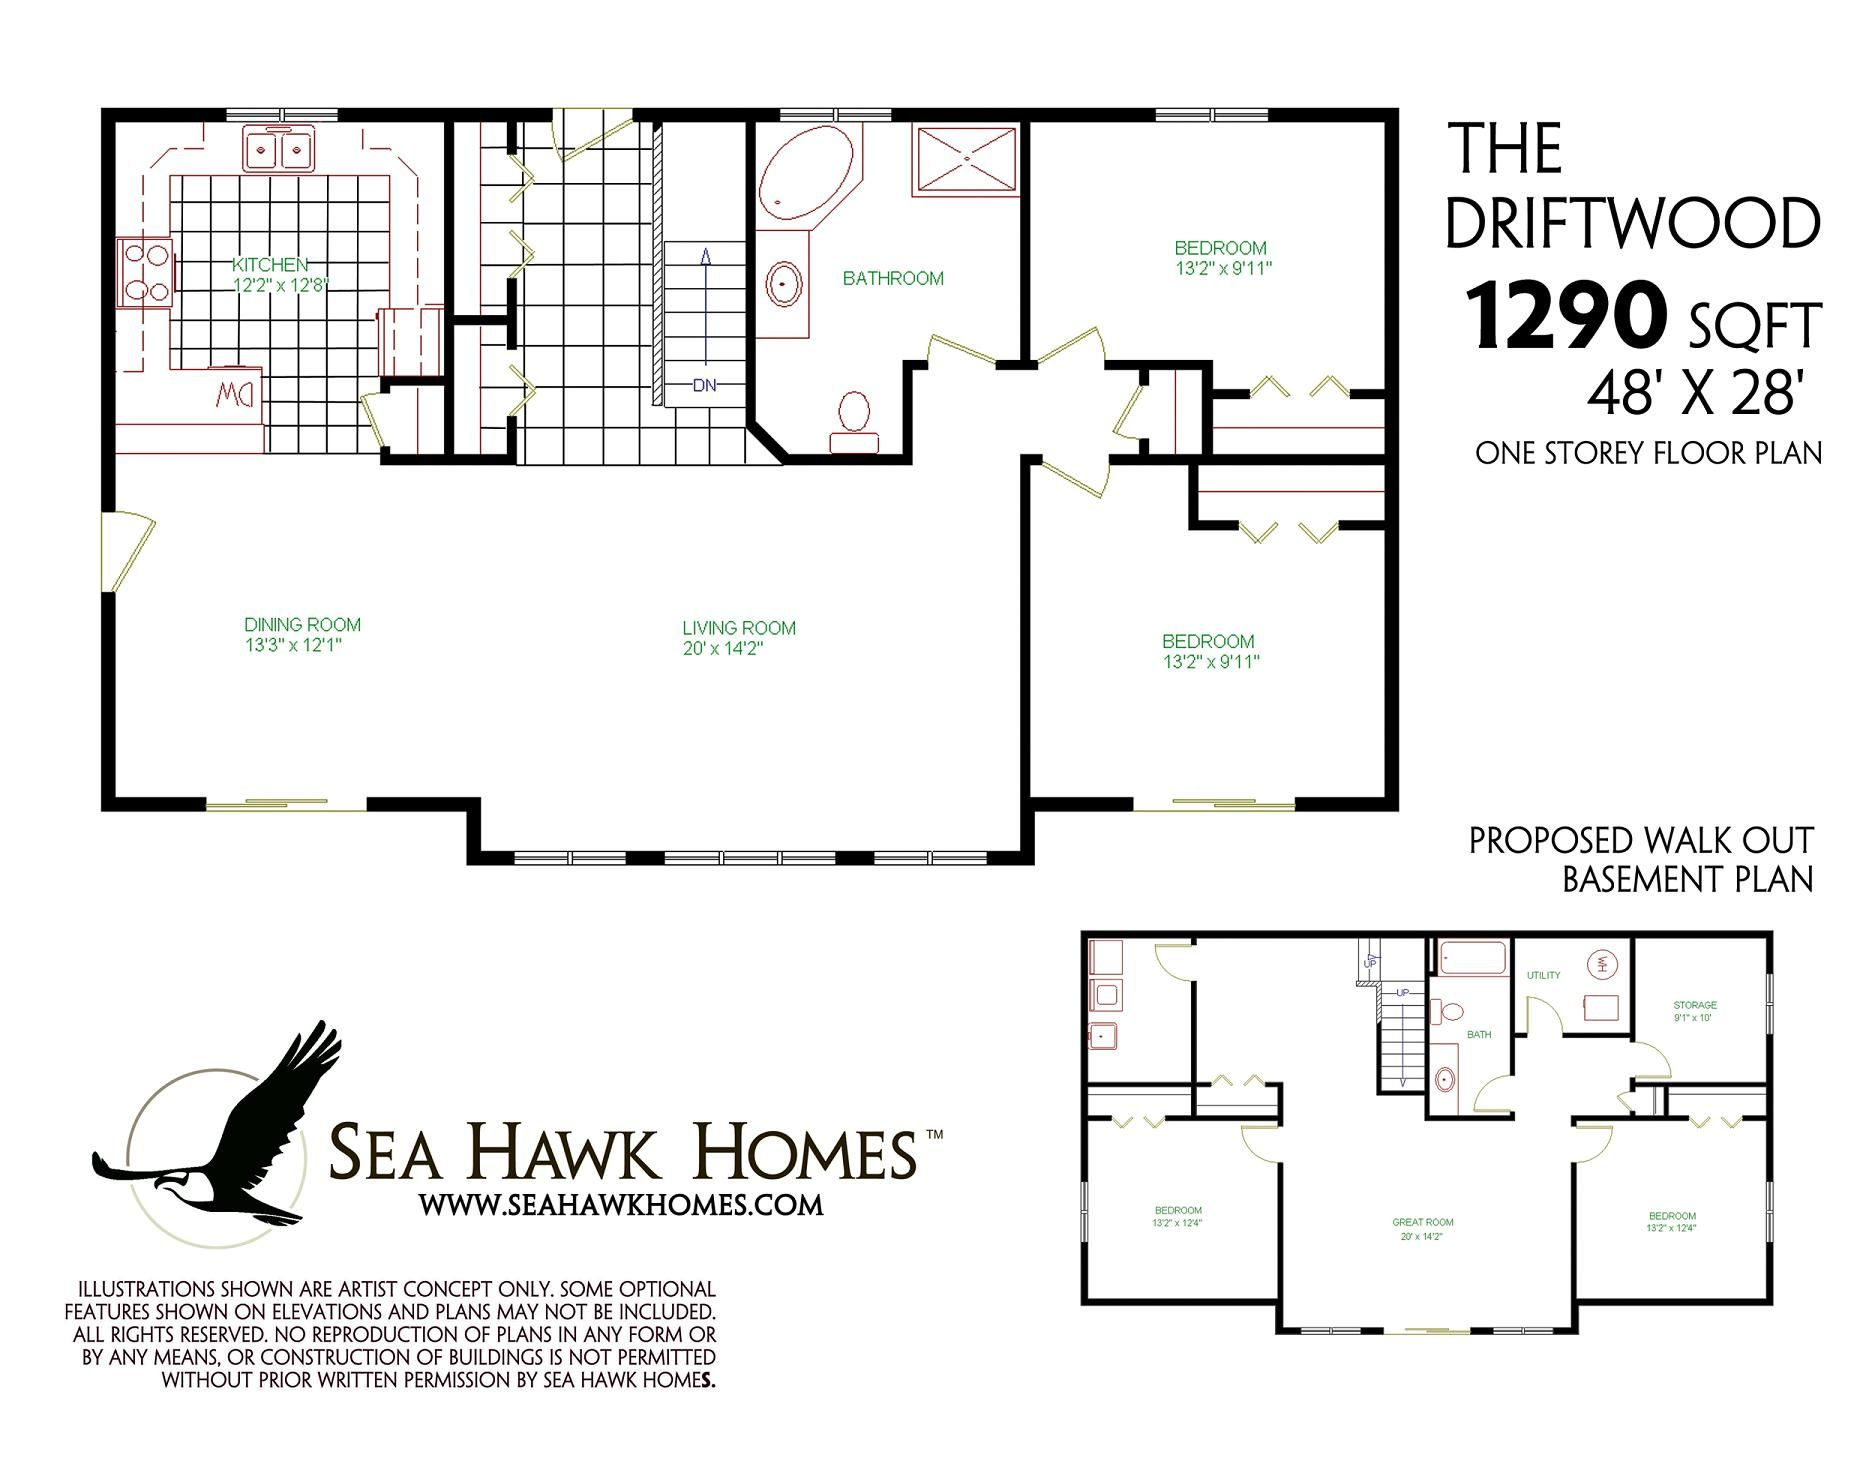 1200 Sq Ft Basement Floor Plans Google Search Basement Floor Plans Four Bedroom House Plans Bungalow Floor Plans